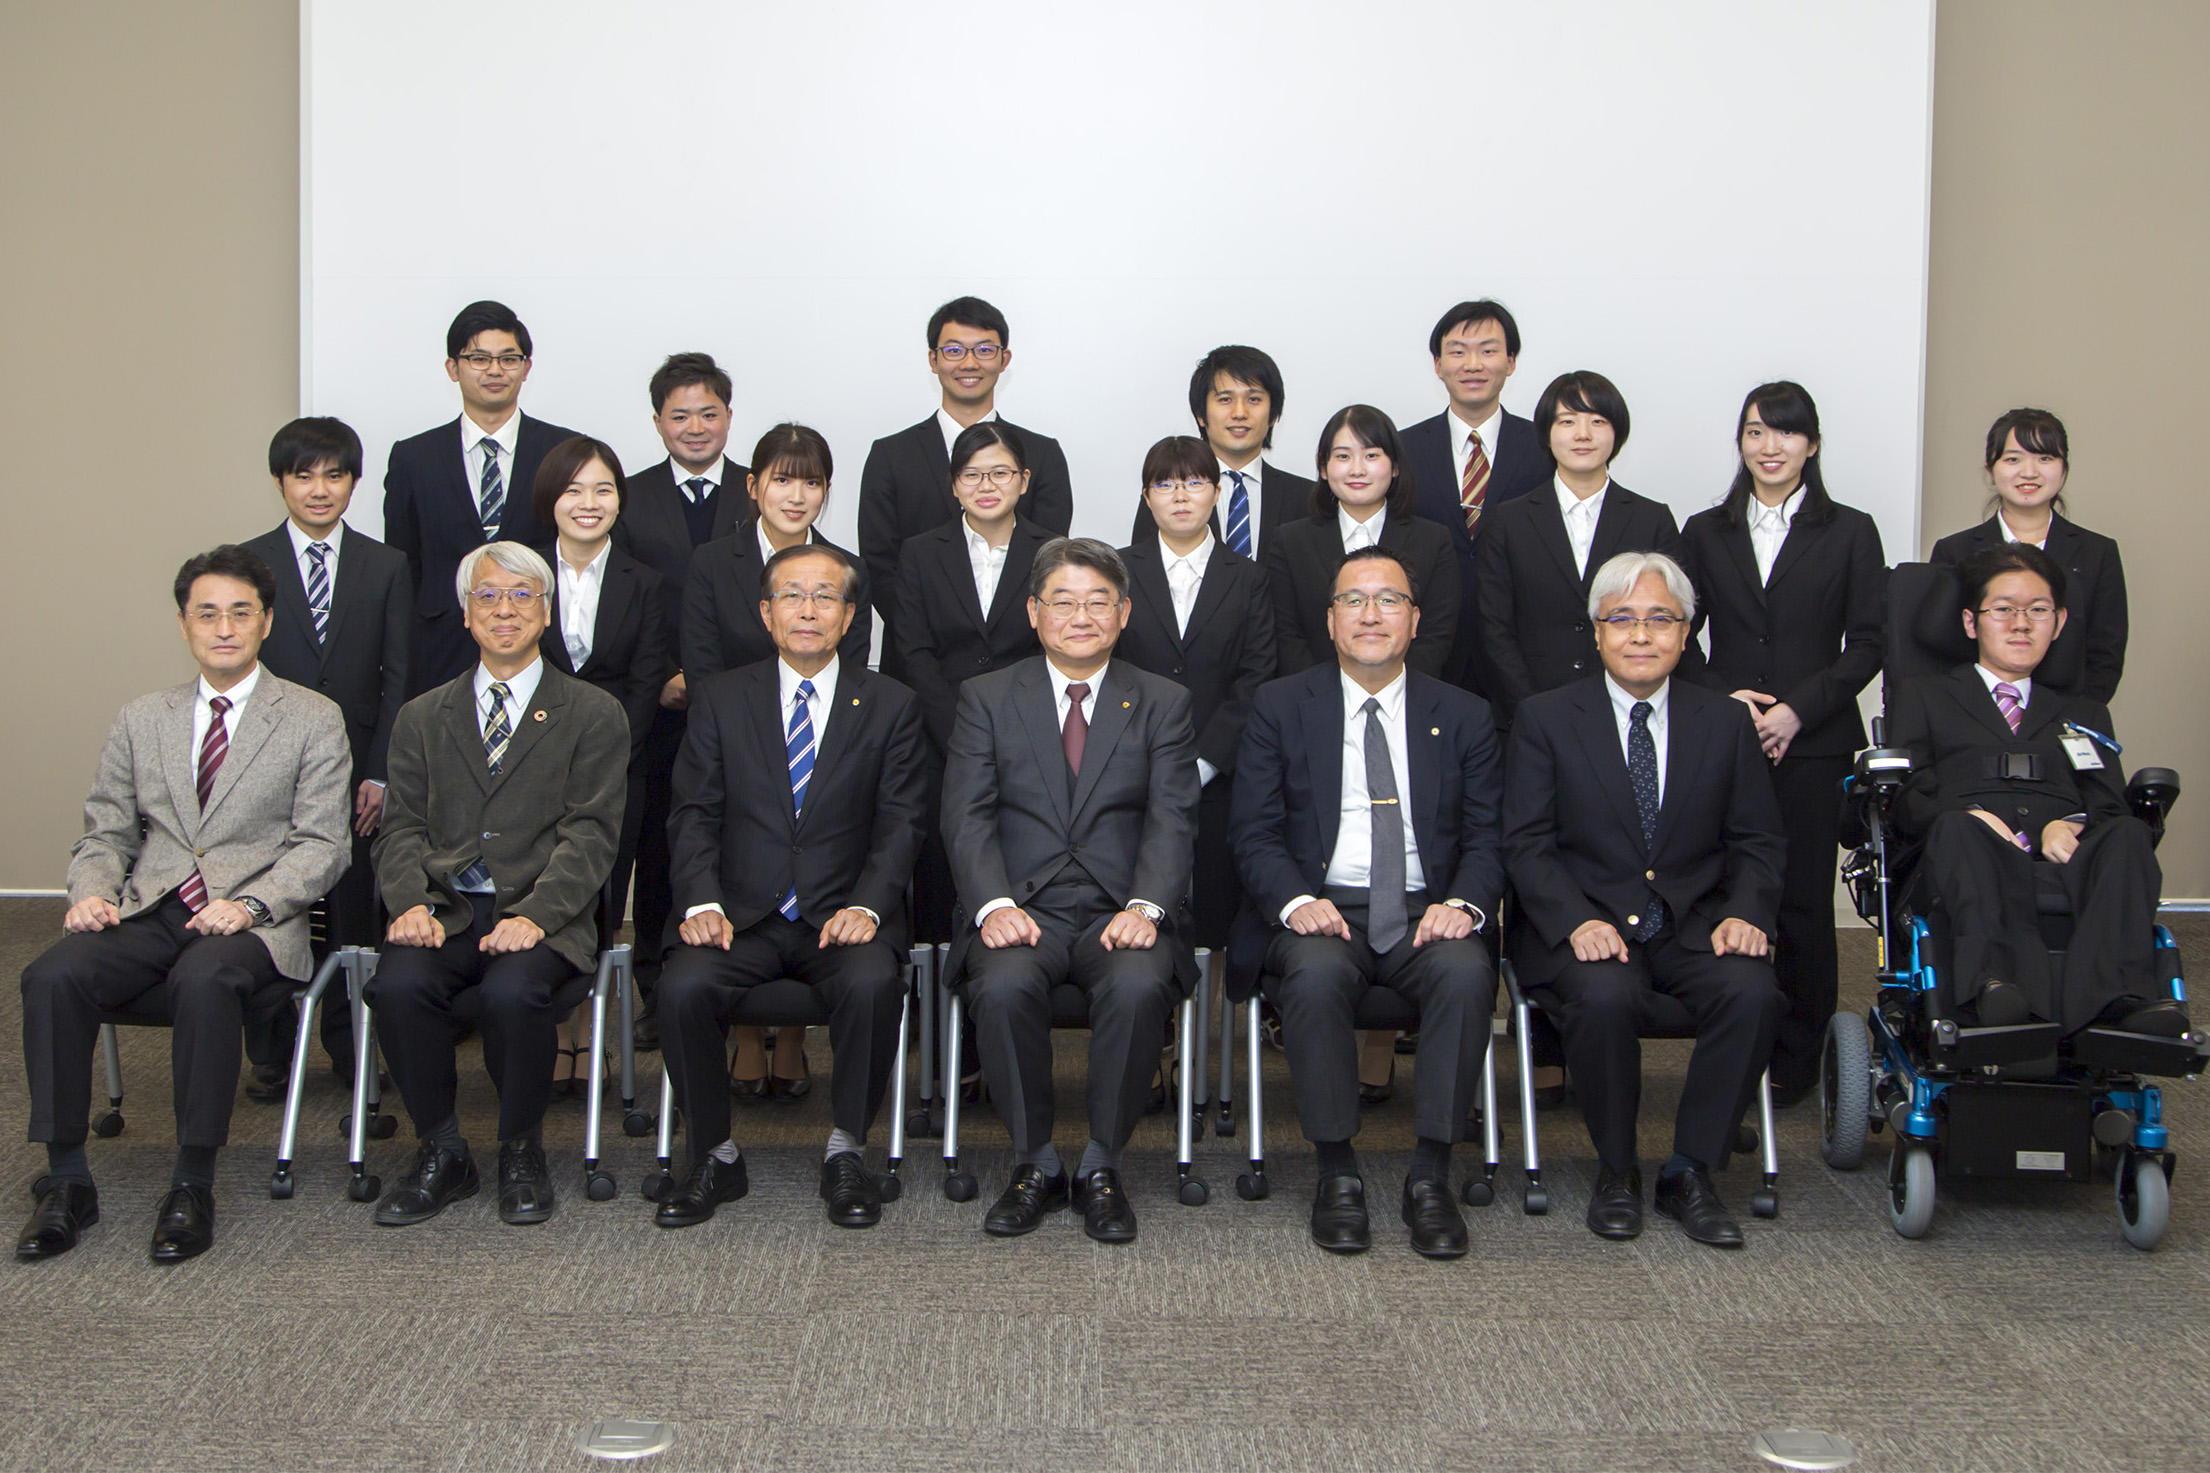 200227gakubu_gakucho_kondanpic02.jpg